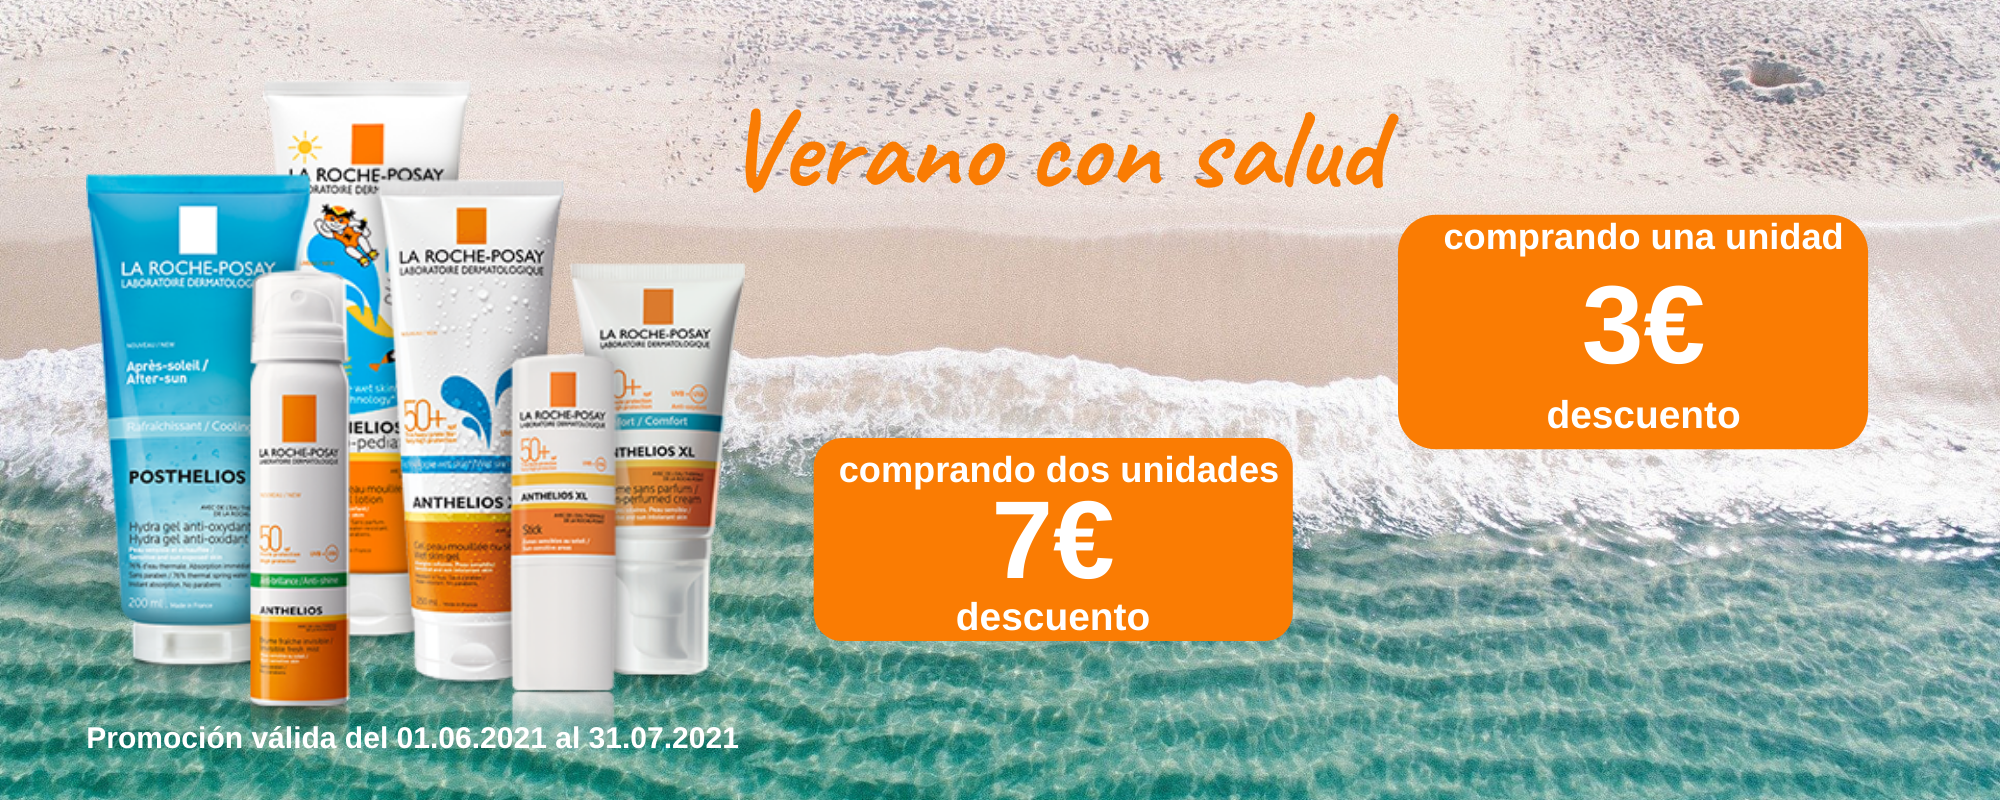 Verano con salud La Roche-possay - Banner Farmacia Ciudad Alta